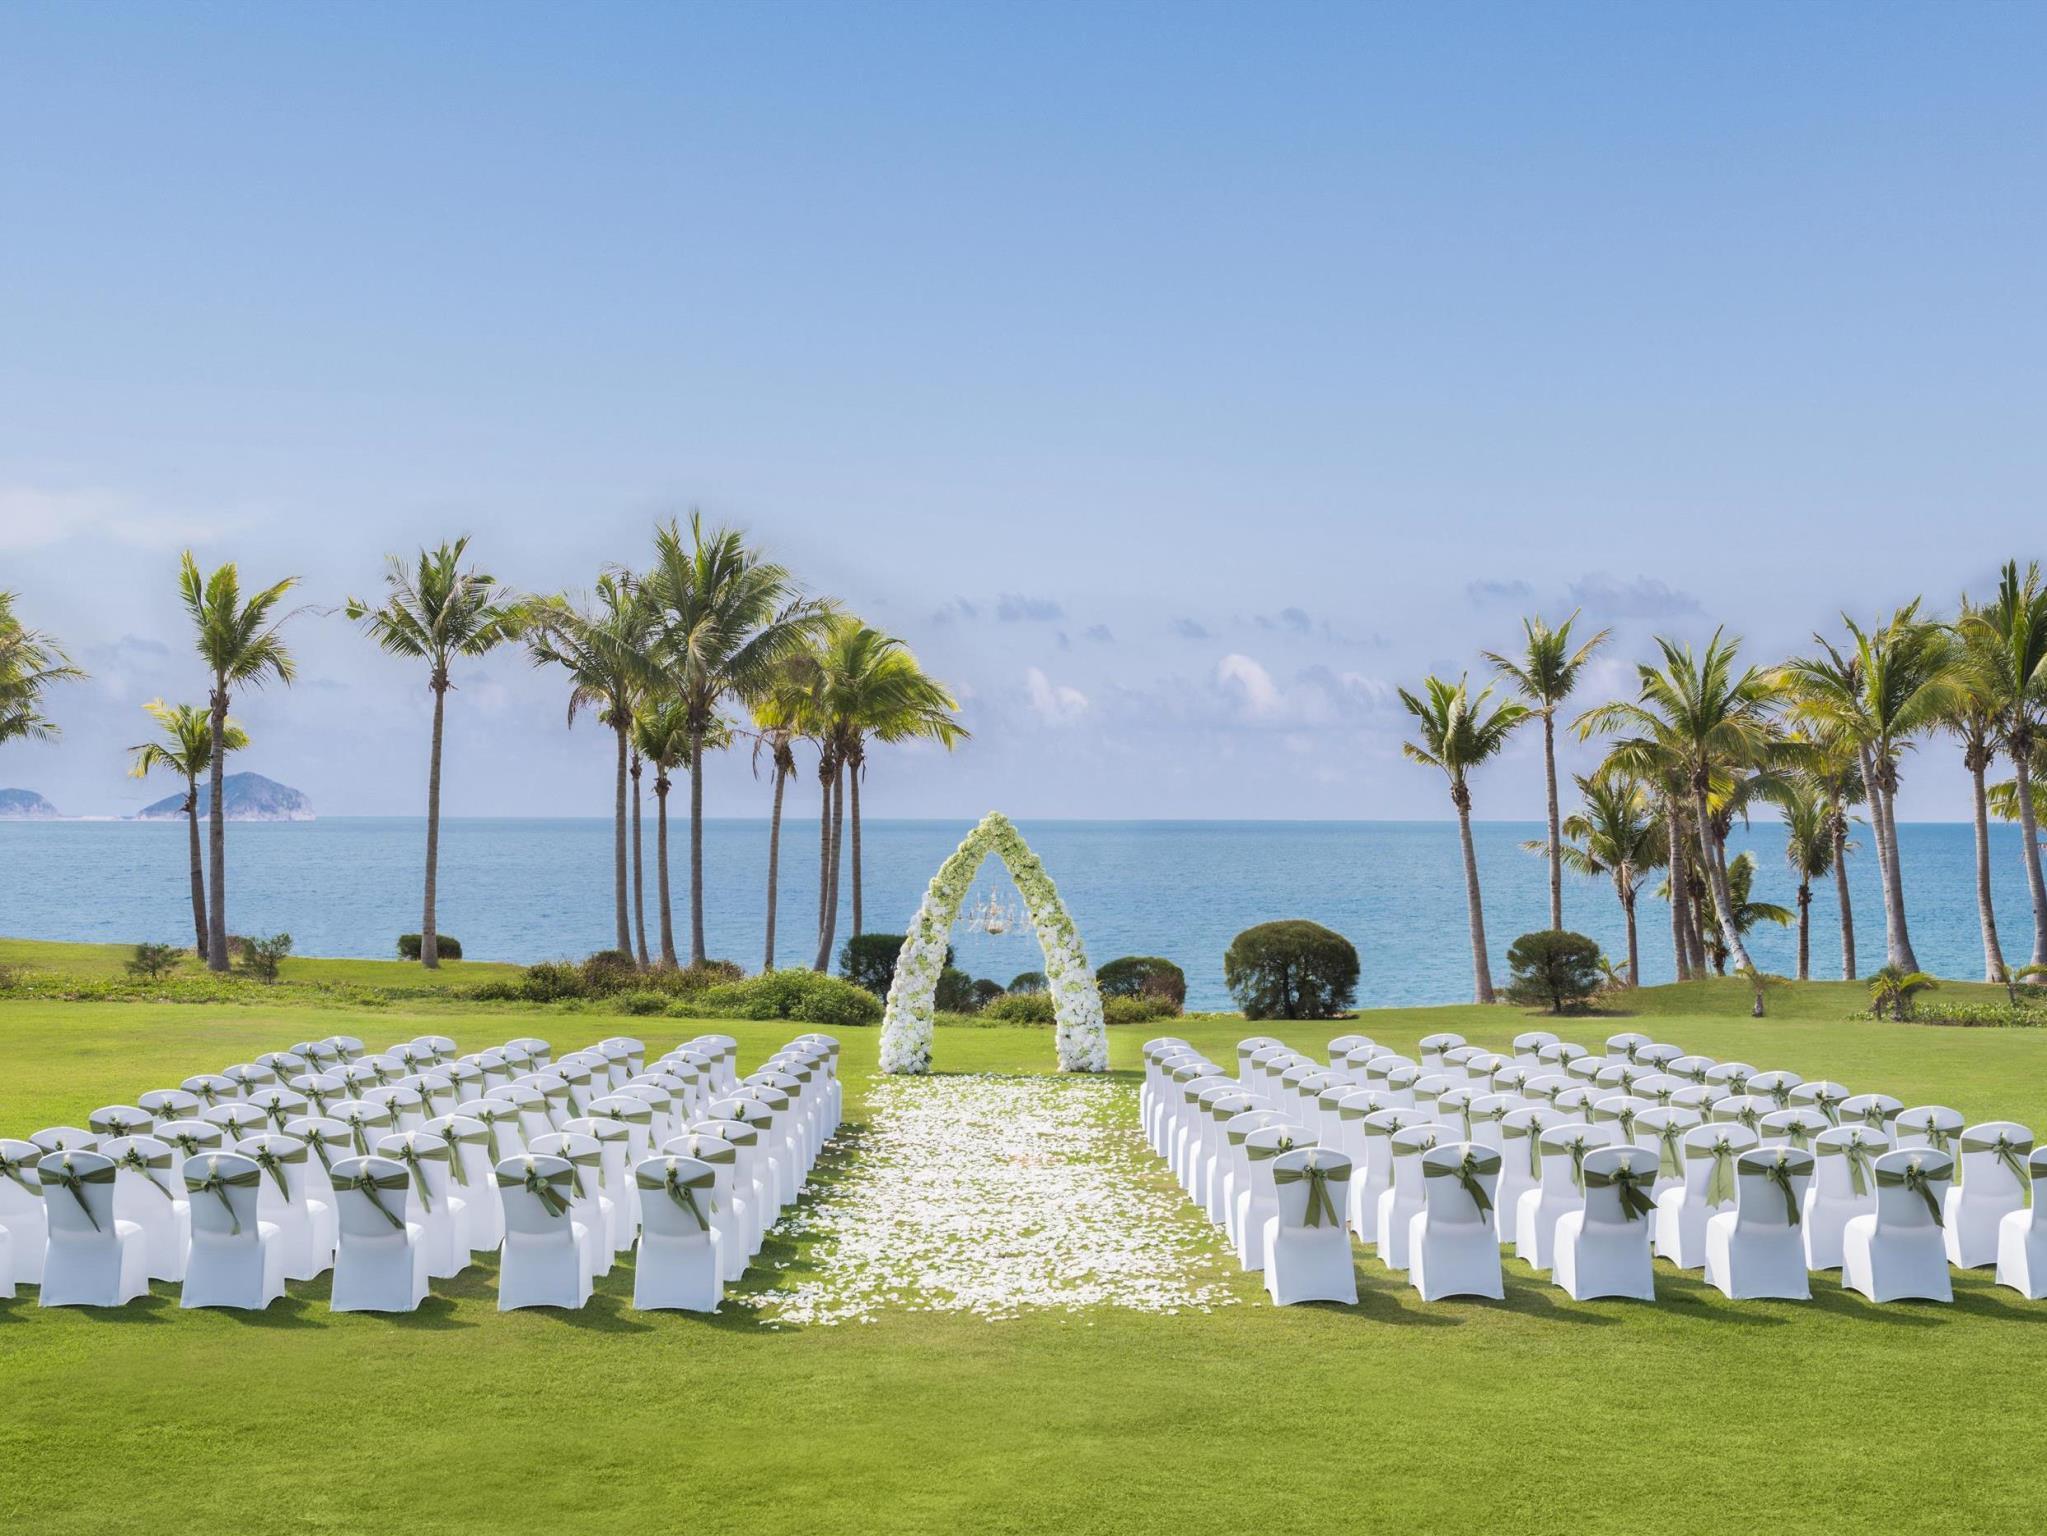 The St. Regis Sanya Yalong Bay Resort